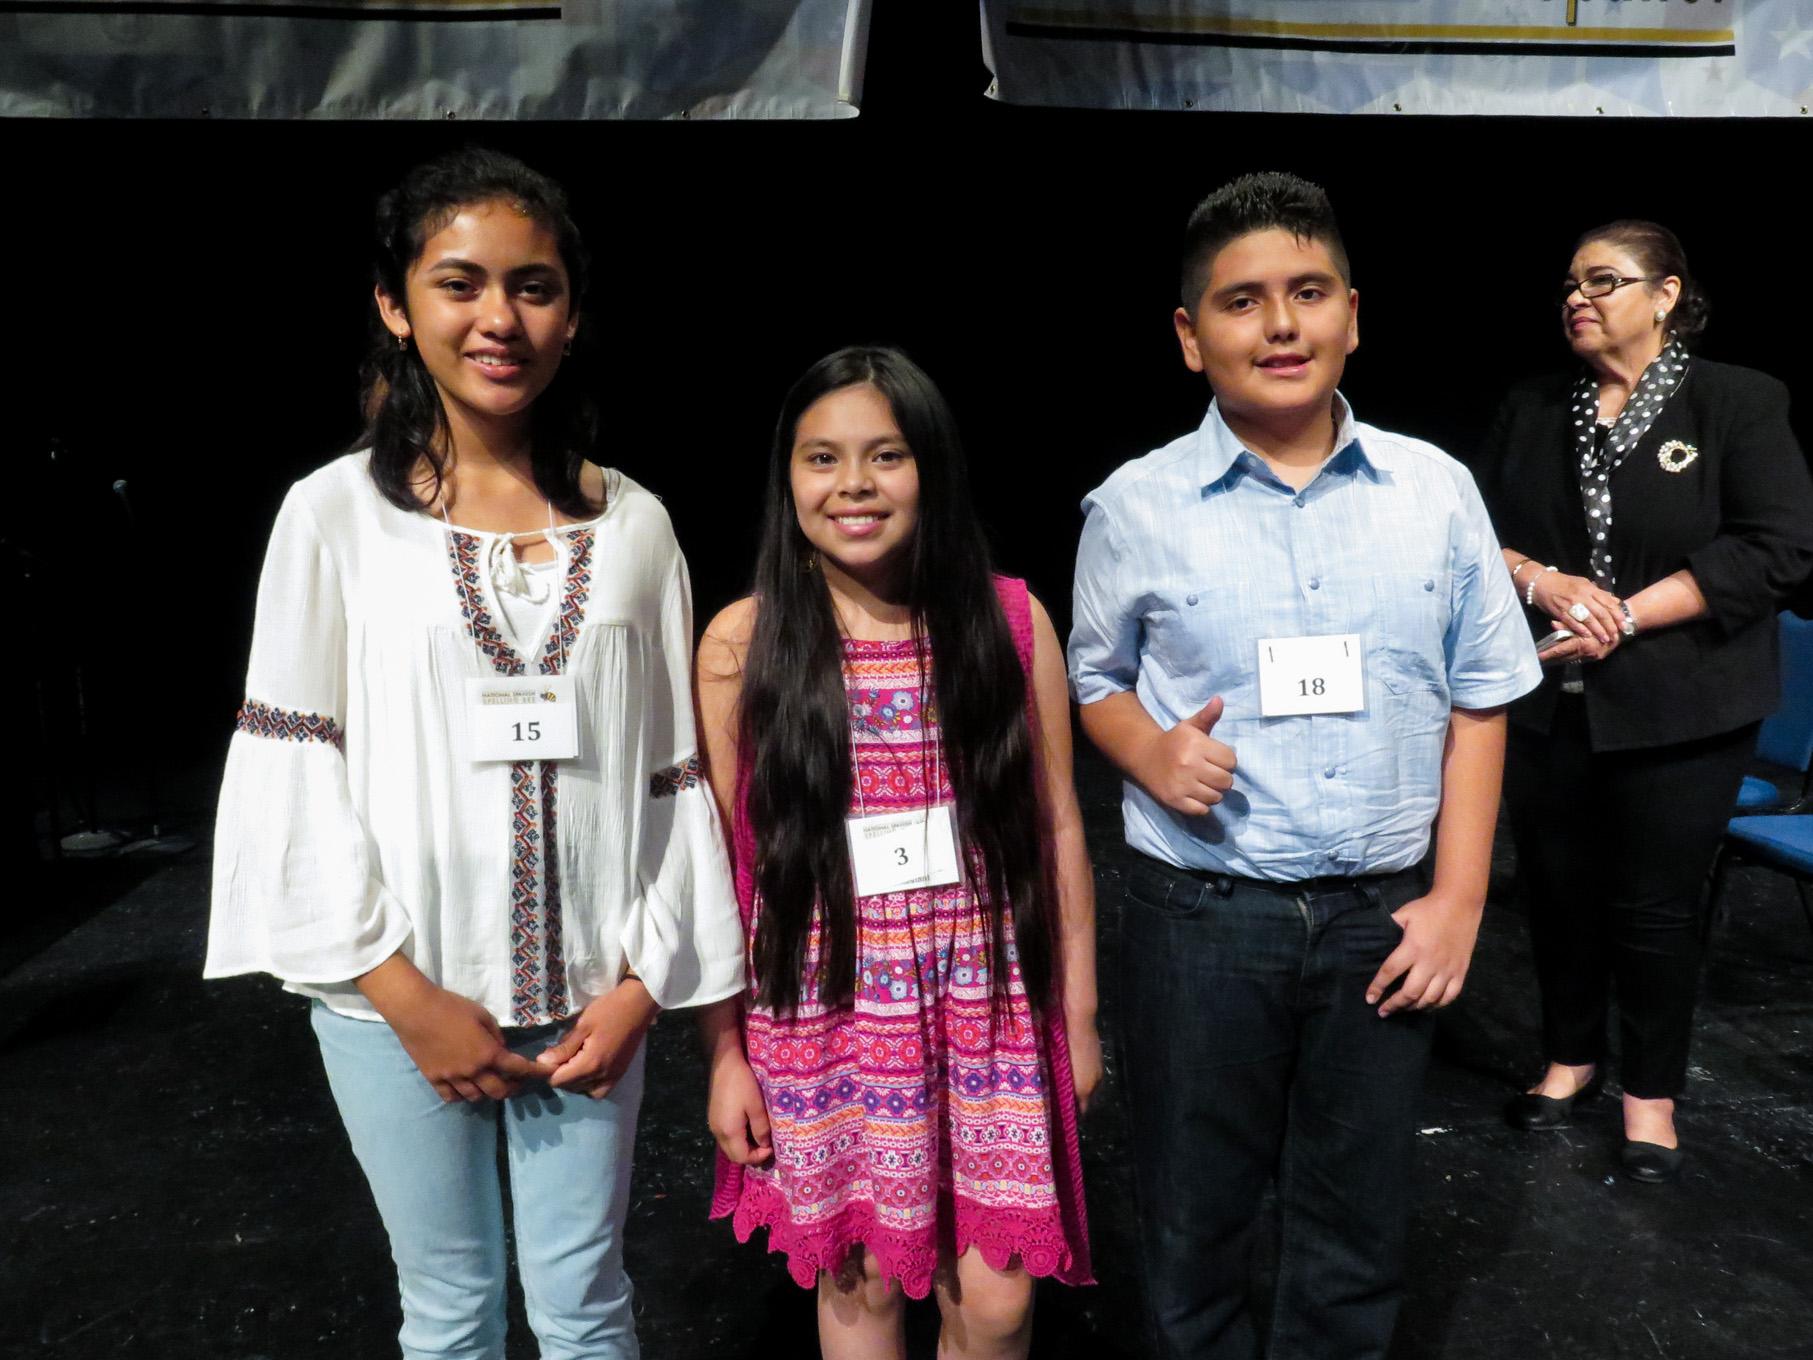 The top three finalists. From Left: Angelique Ibarra, Kiara Rivas Vasquez, and Jybr Reynoso Hidrogo.